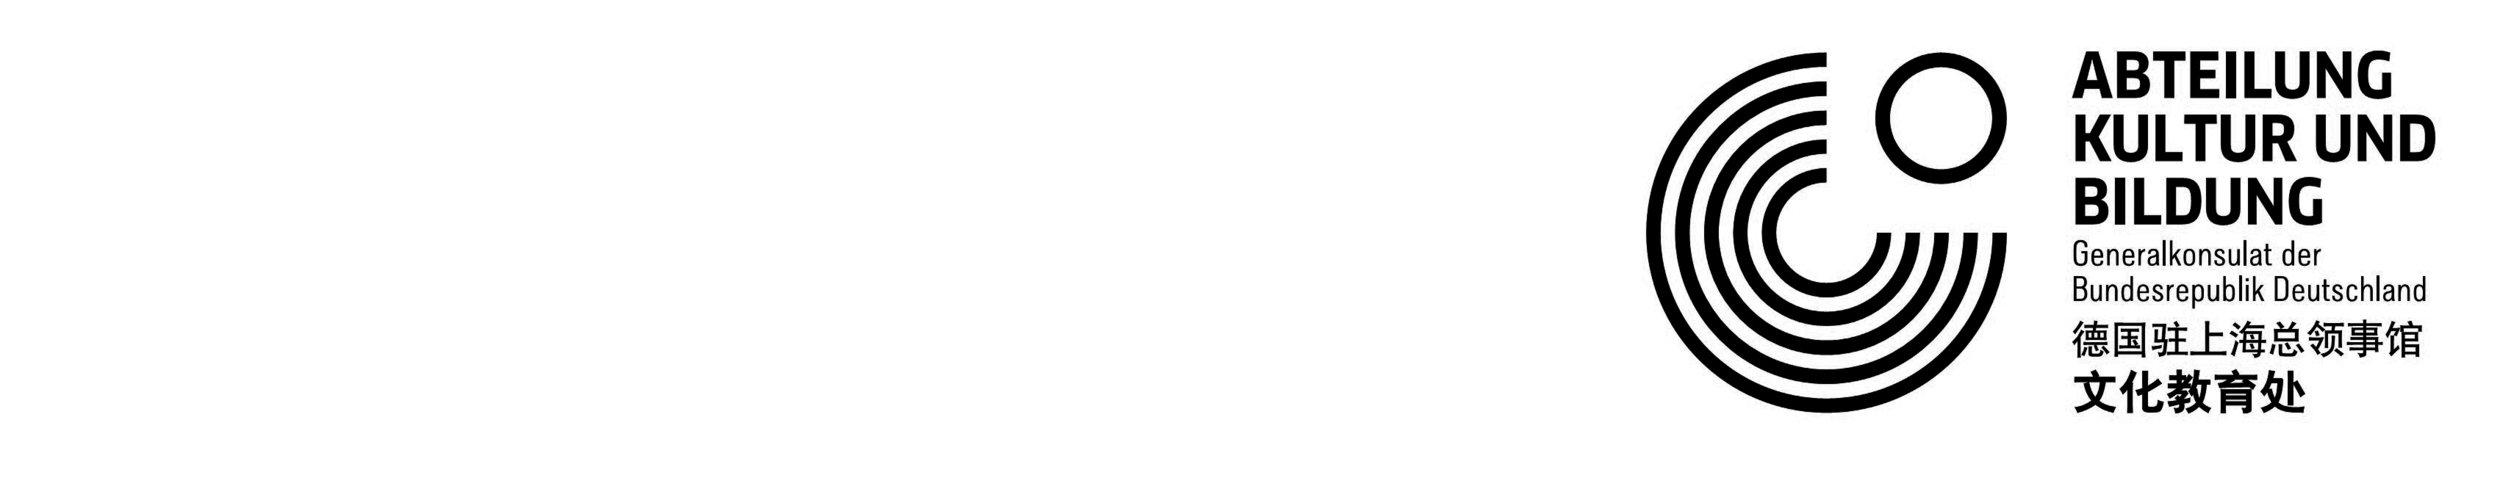 Logo AKuB copy-long.jpg